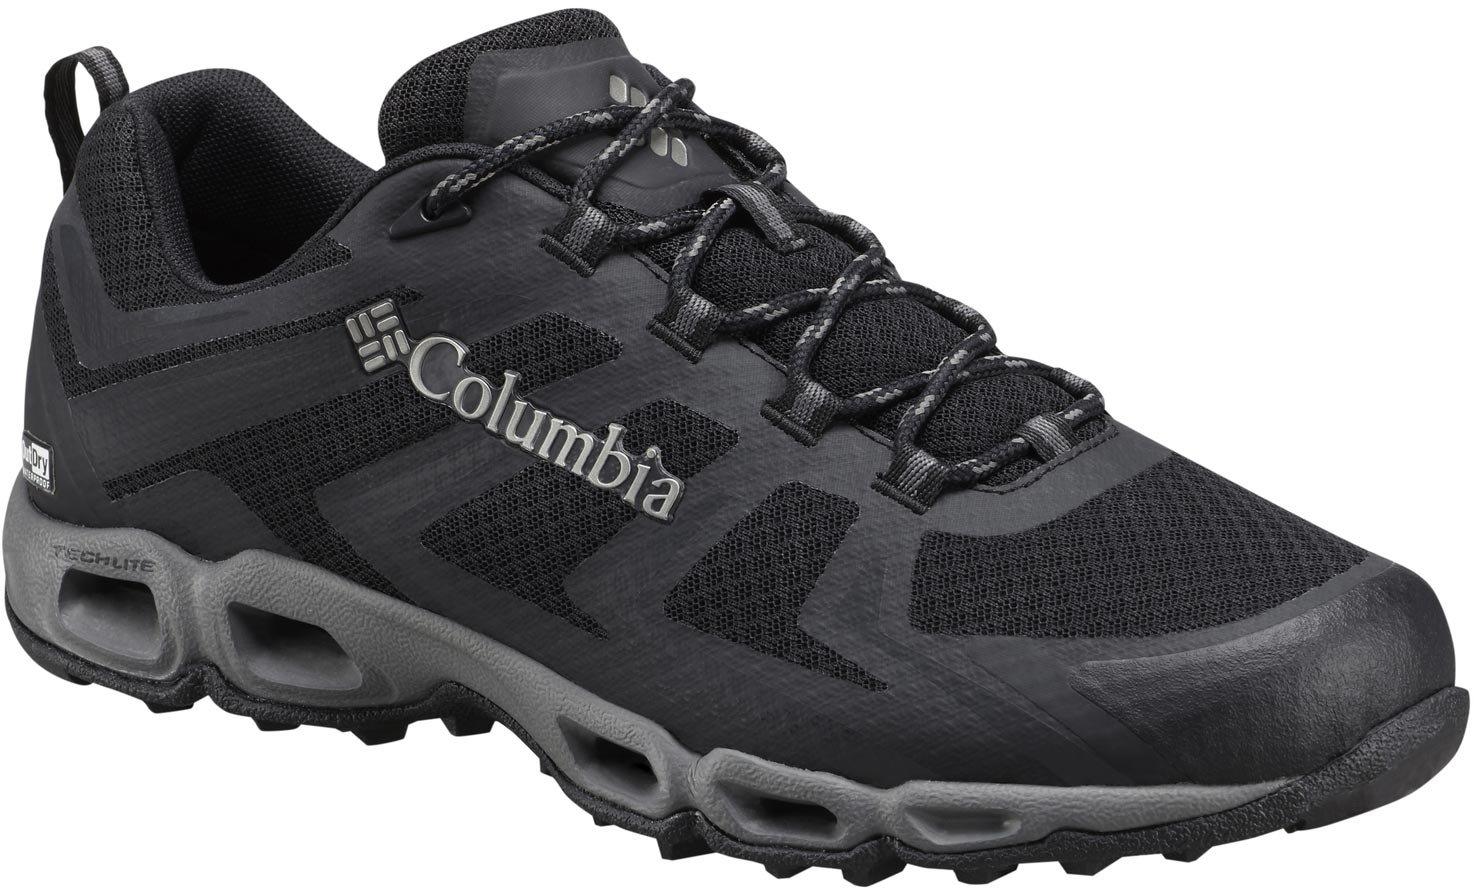 Columbia Ventrailia 3 Low Outdry 43 6b98ddbba1